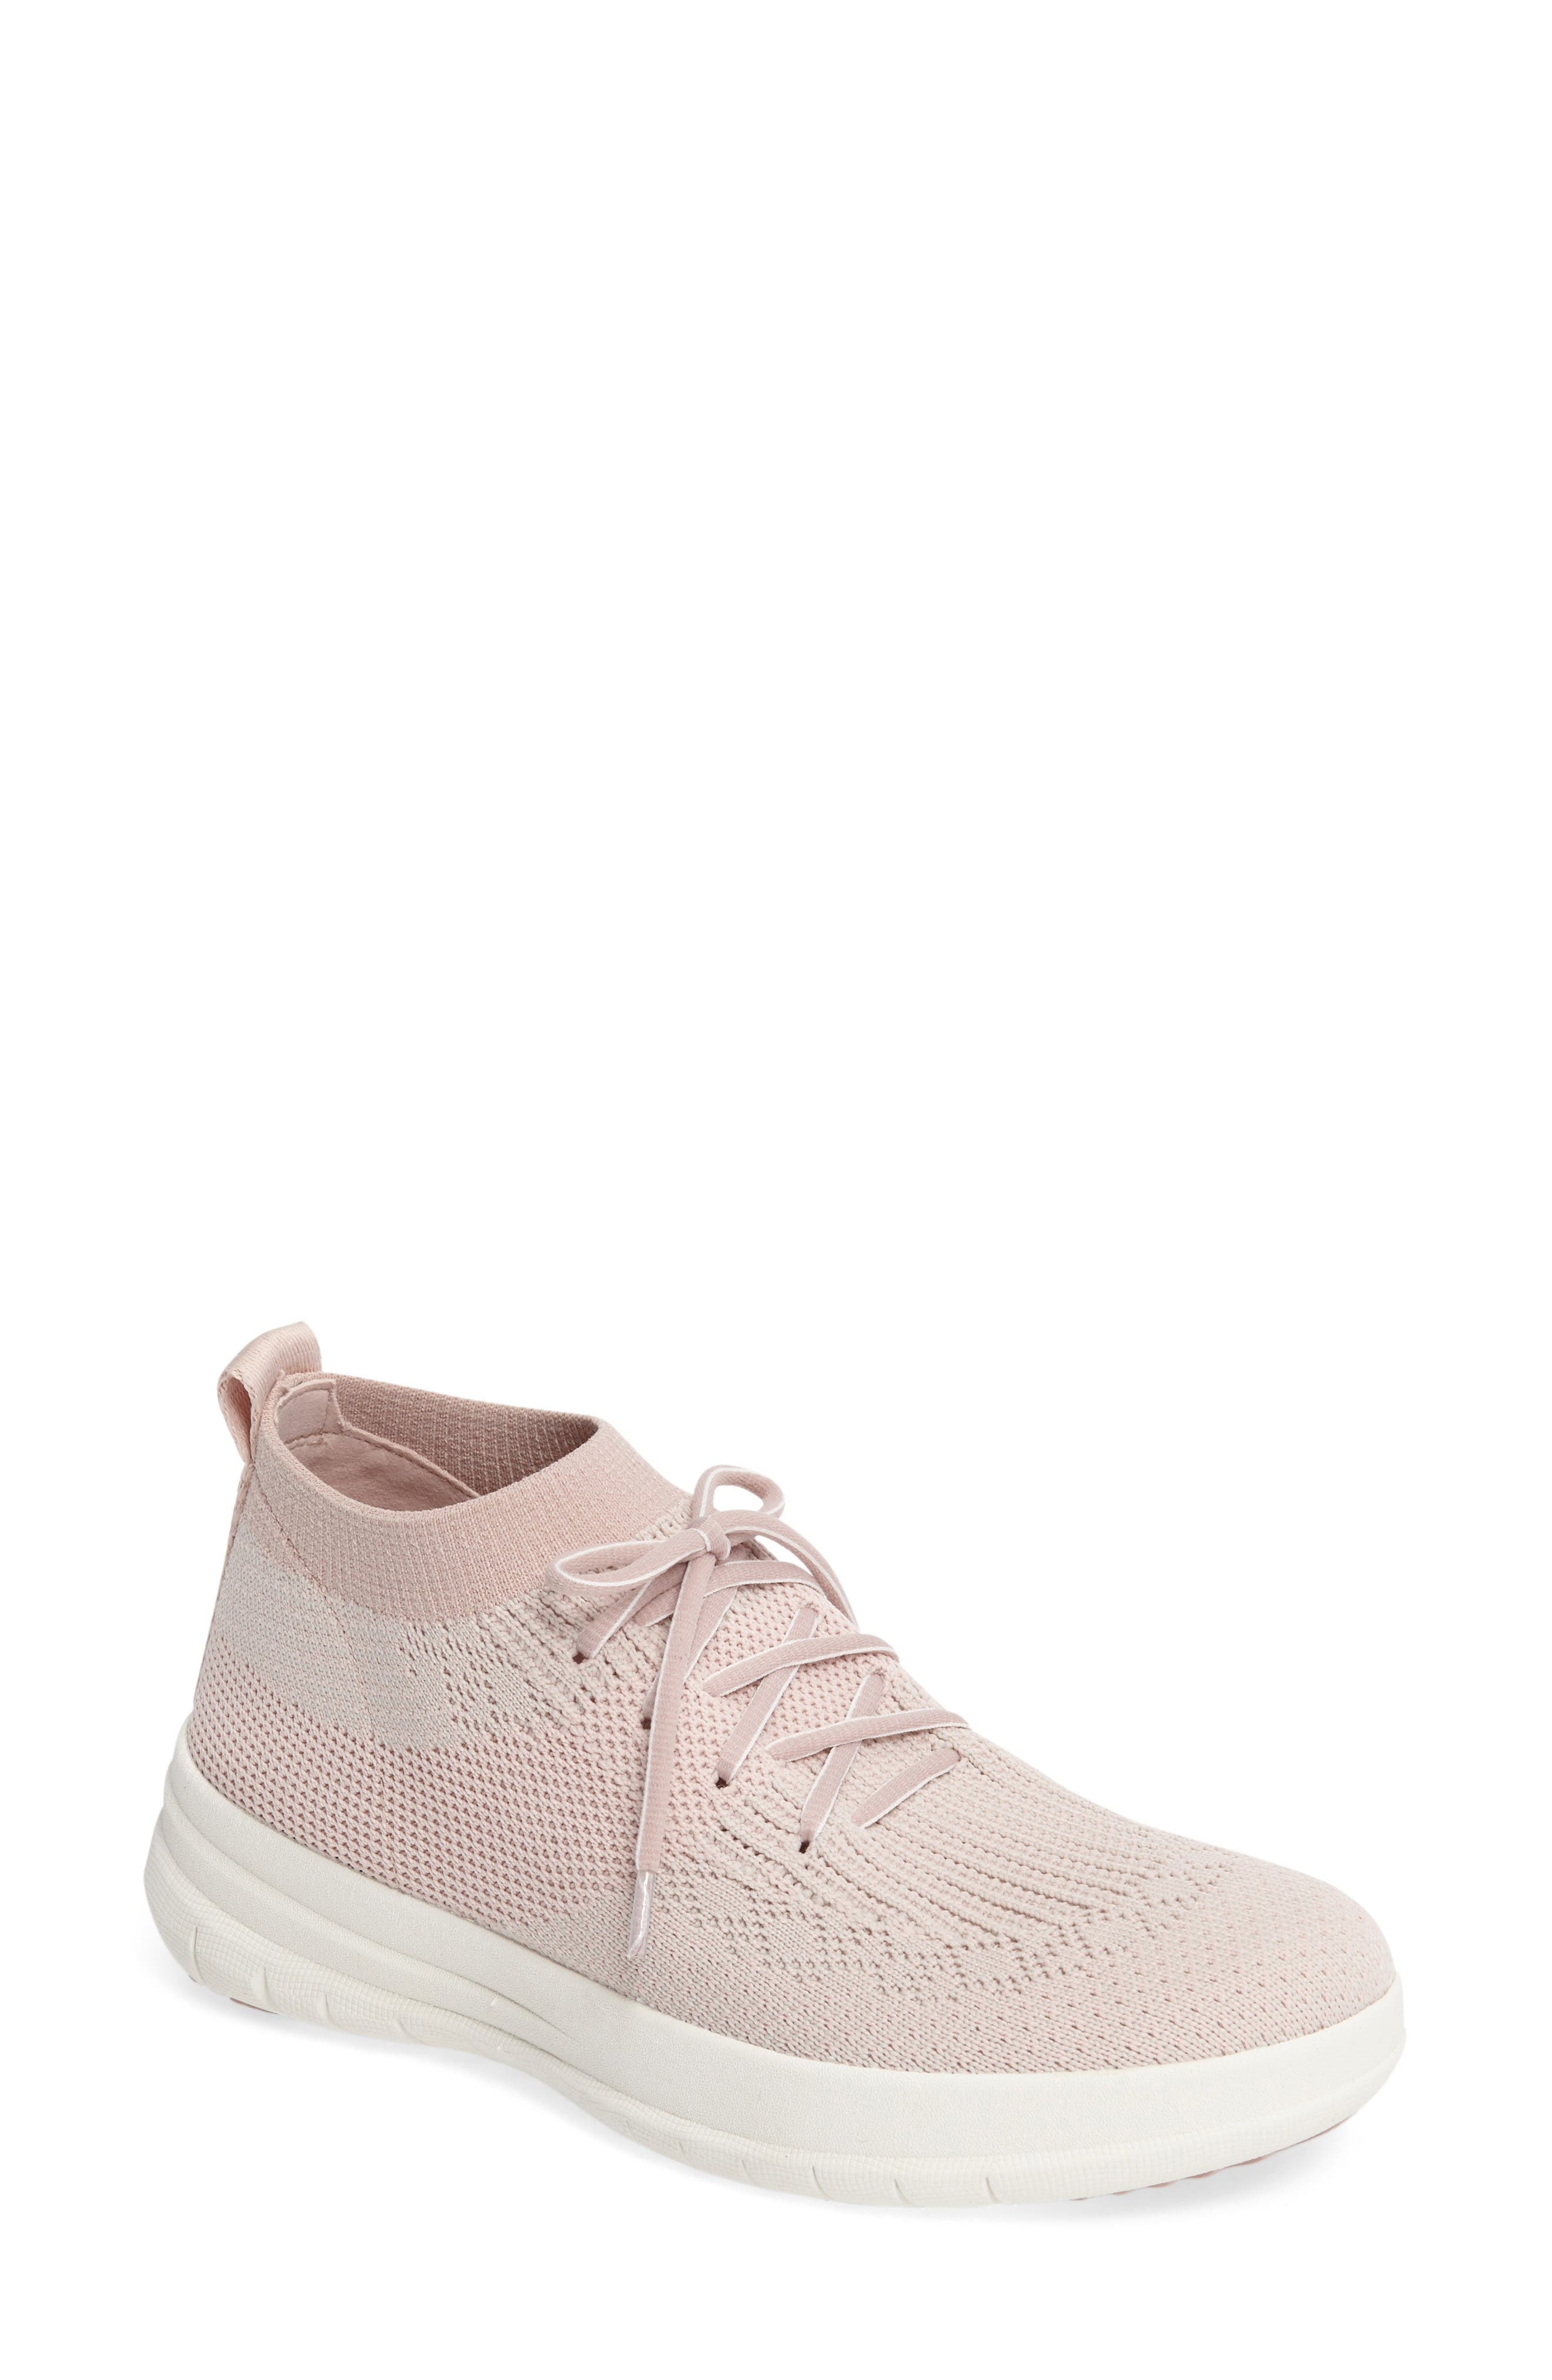 Überknit High Top Sneaker,                             Main thumbnail 1, color,                             Neon Blush/ White Fabric